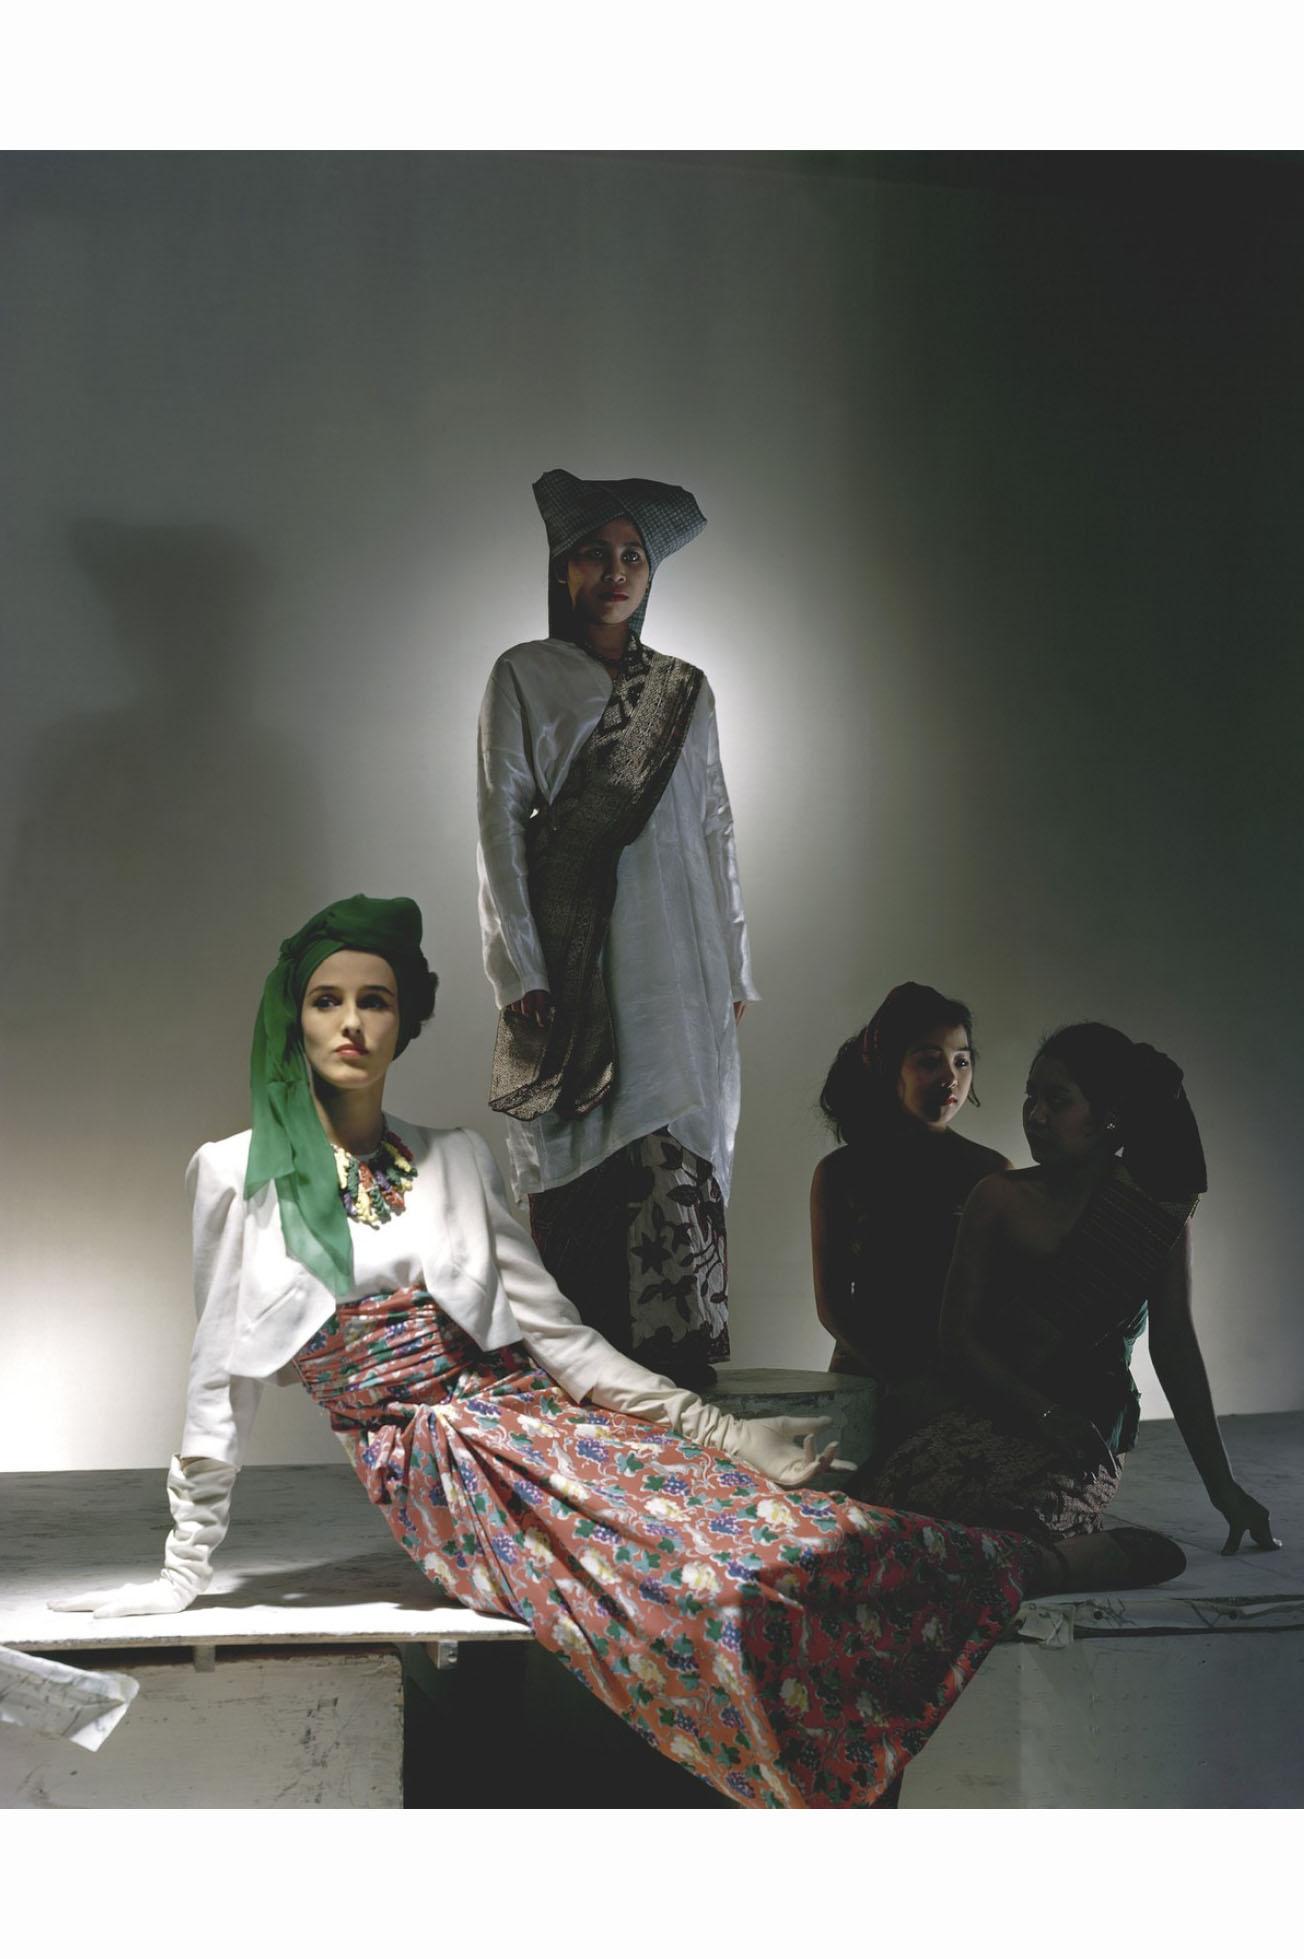 Brazilian influence on fashion 2006 michael kors Photo Products : Pro Digital Photos